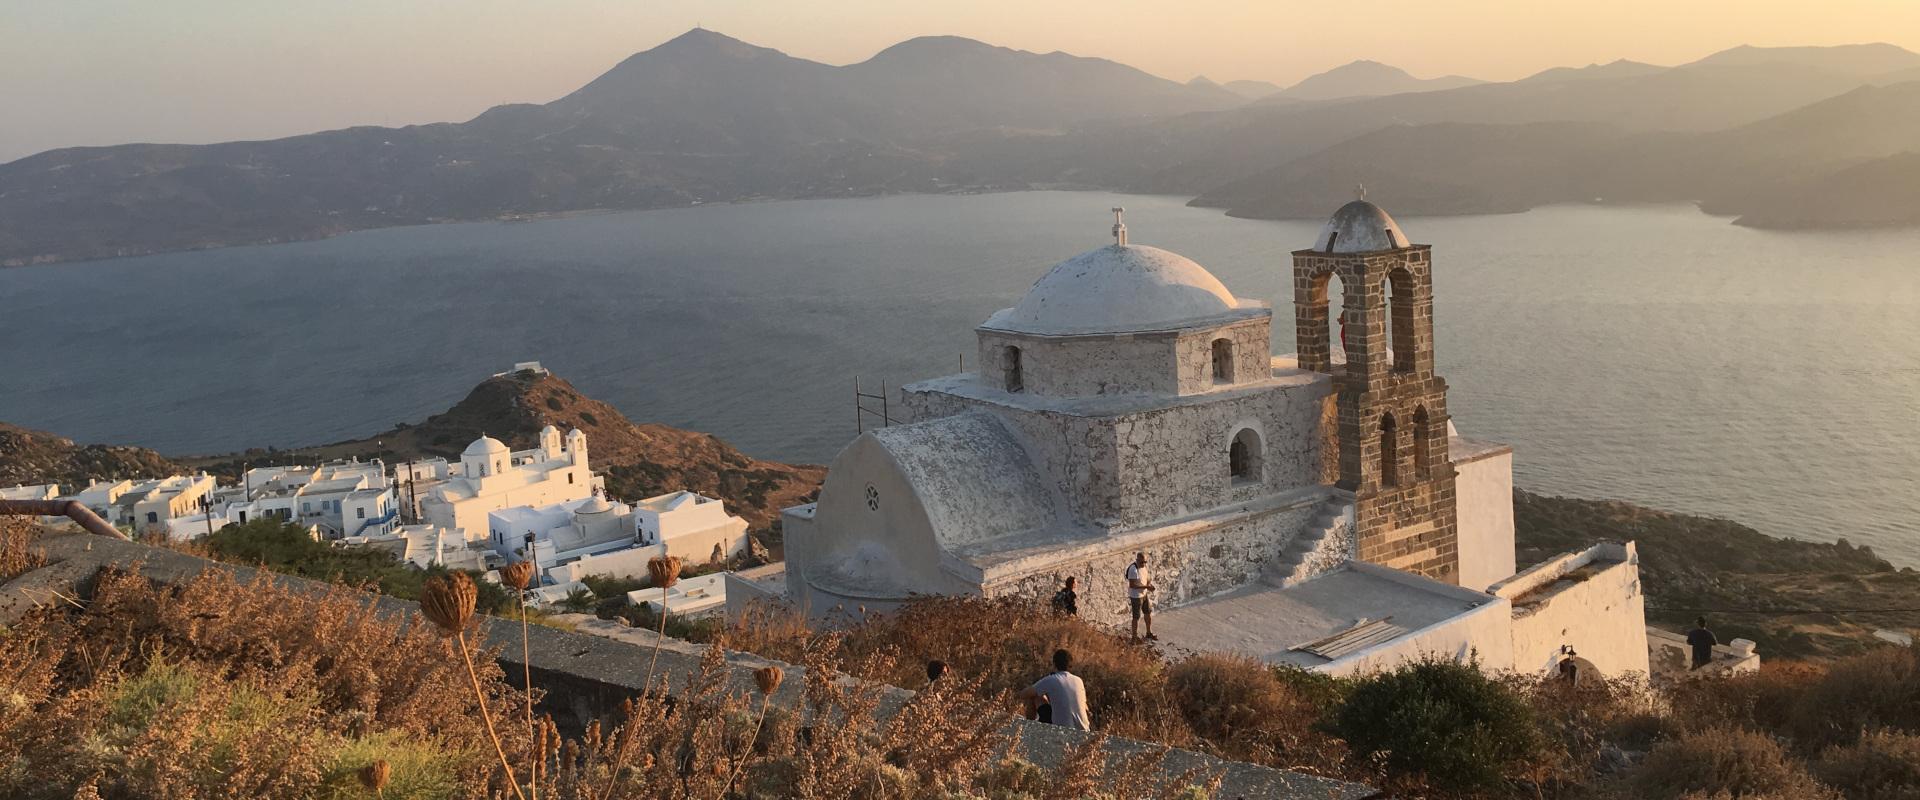 Insel Milos in Griechenland